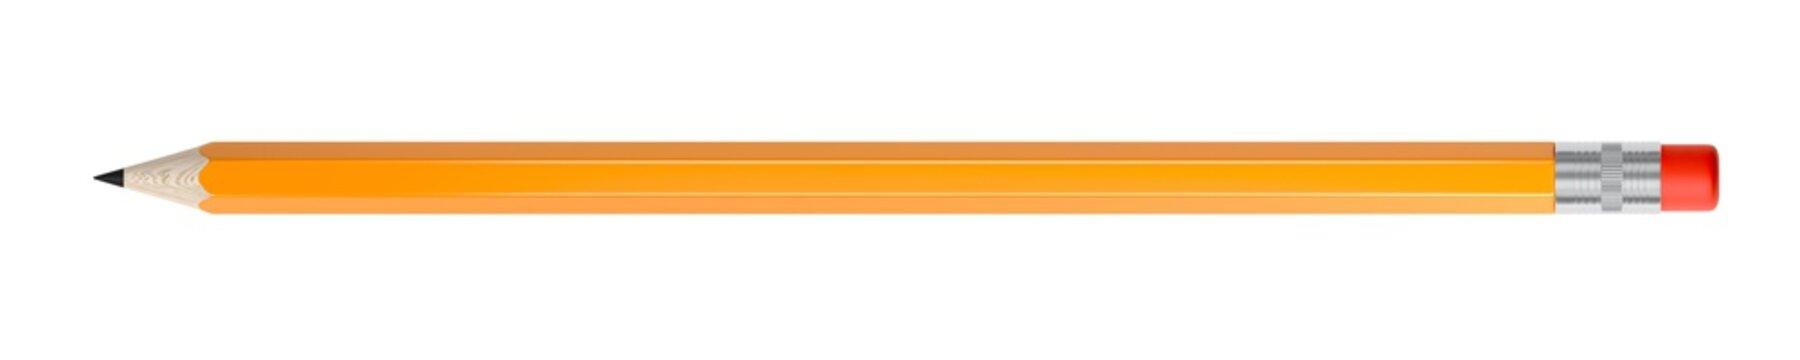 Orange pencil isolated on white background. Eraser. 3d illustration.